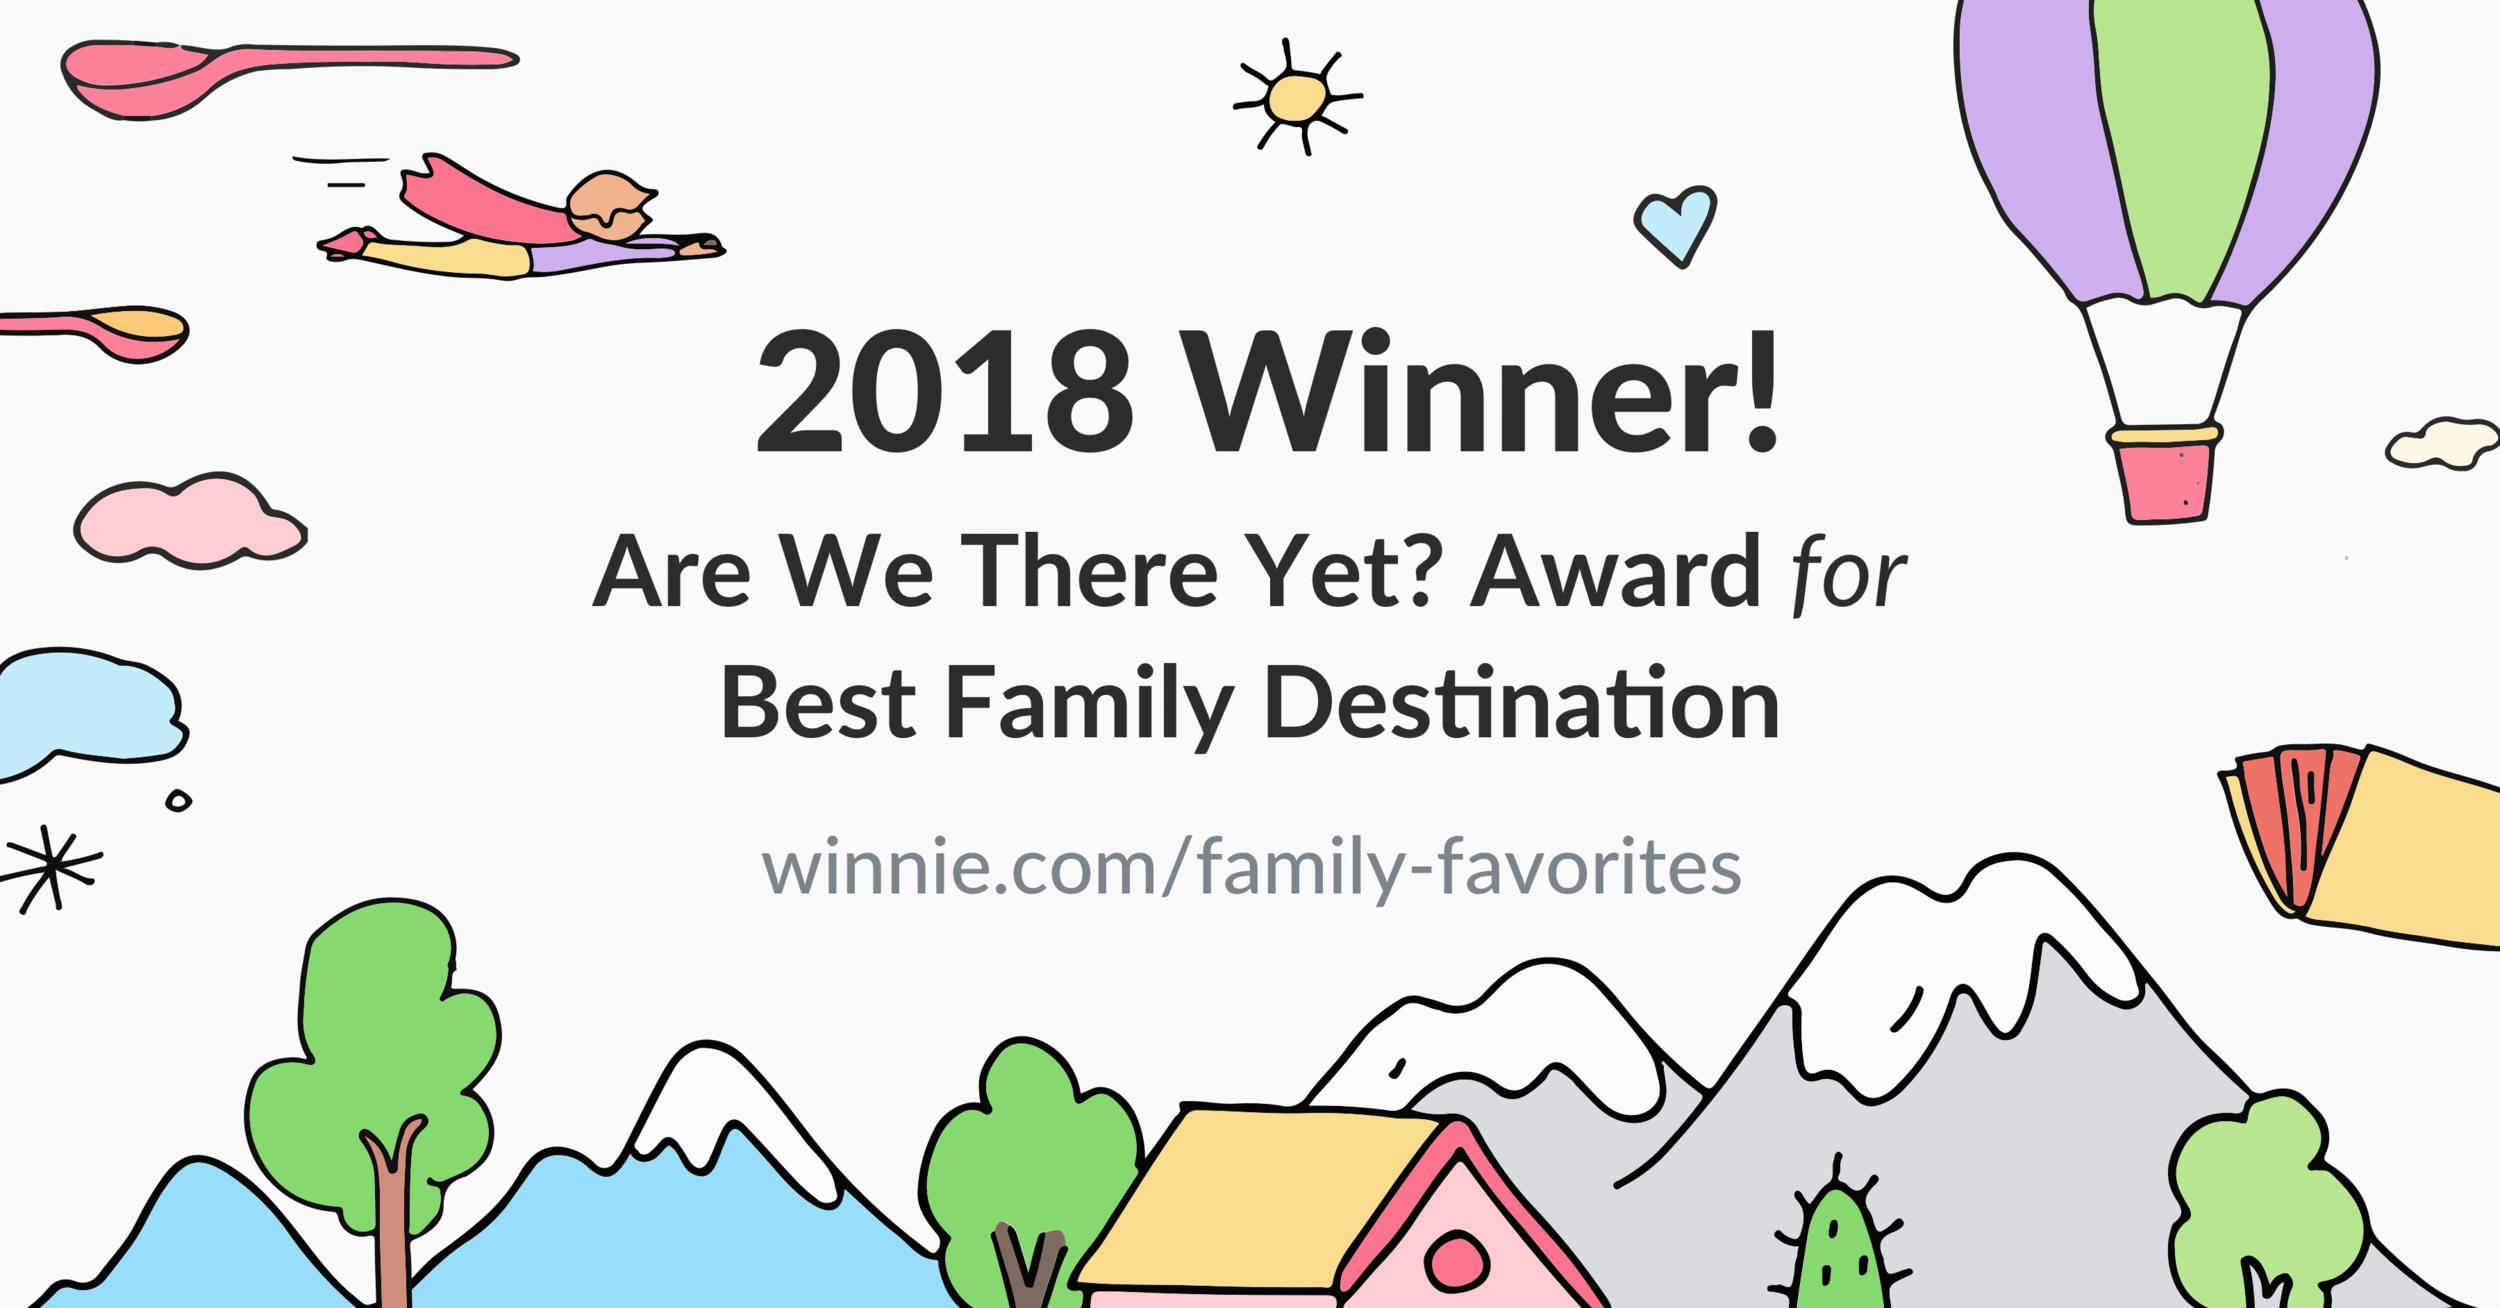 facebook_family_destination_2018.png